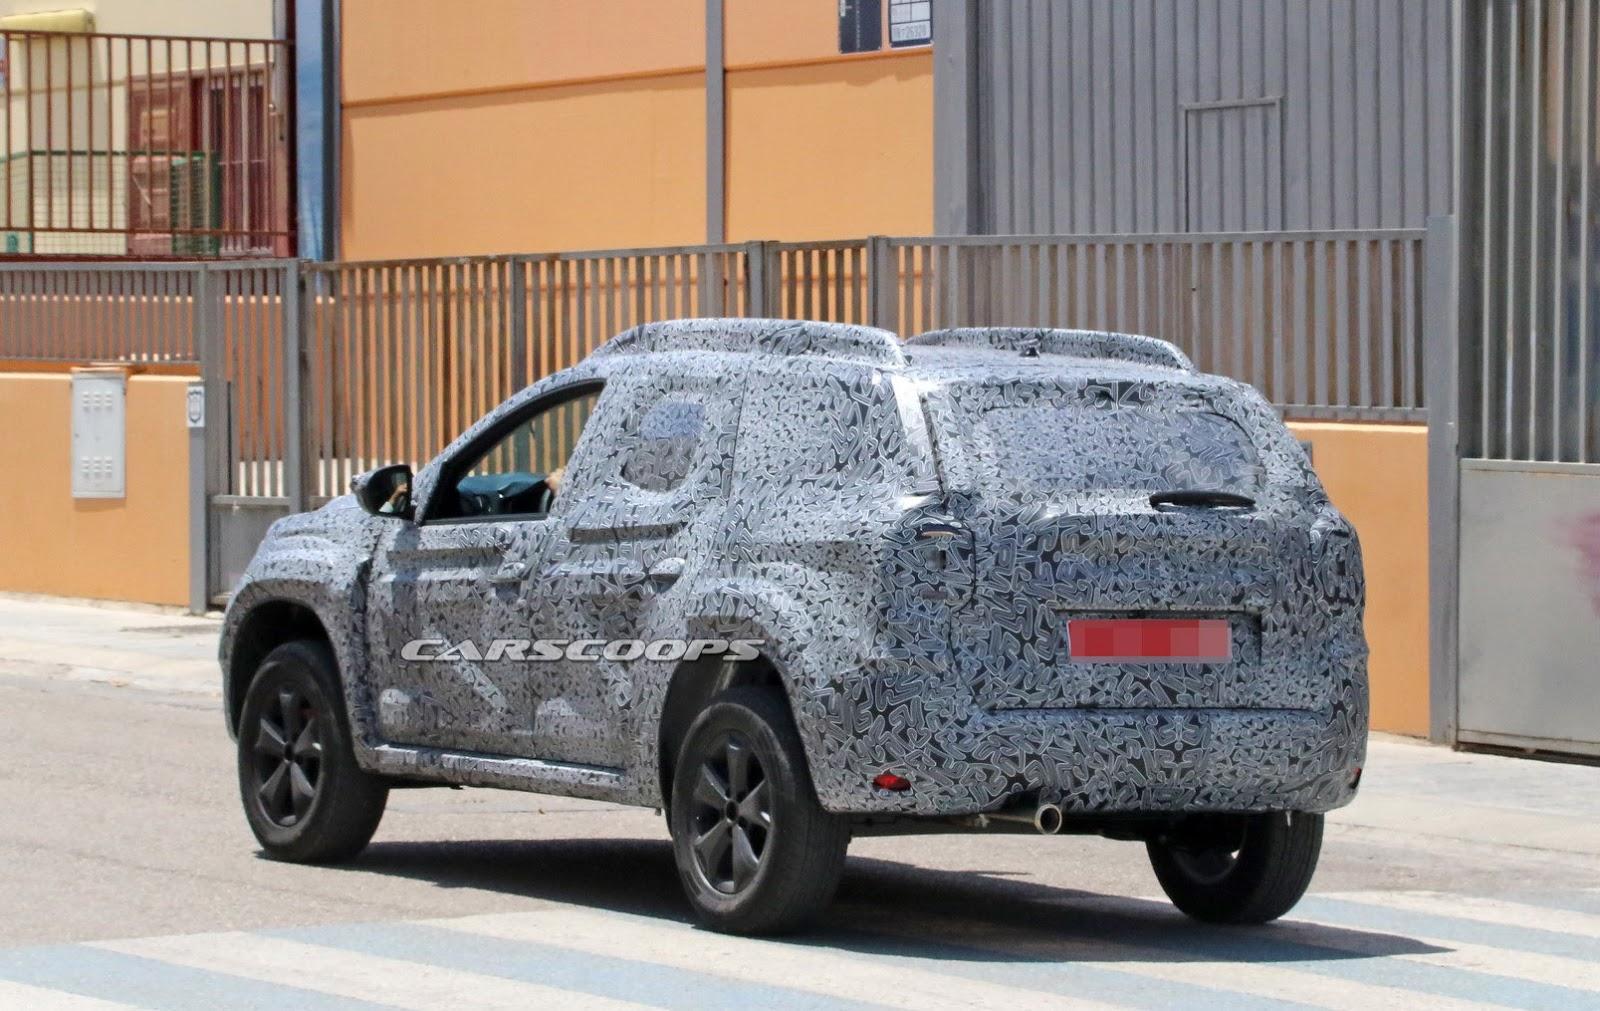 2018-Dacia-Duster-SUV-7.jpg